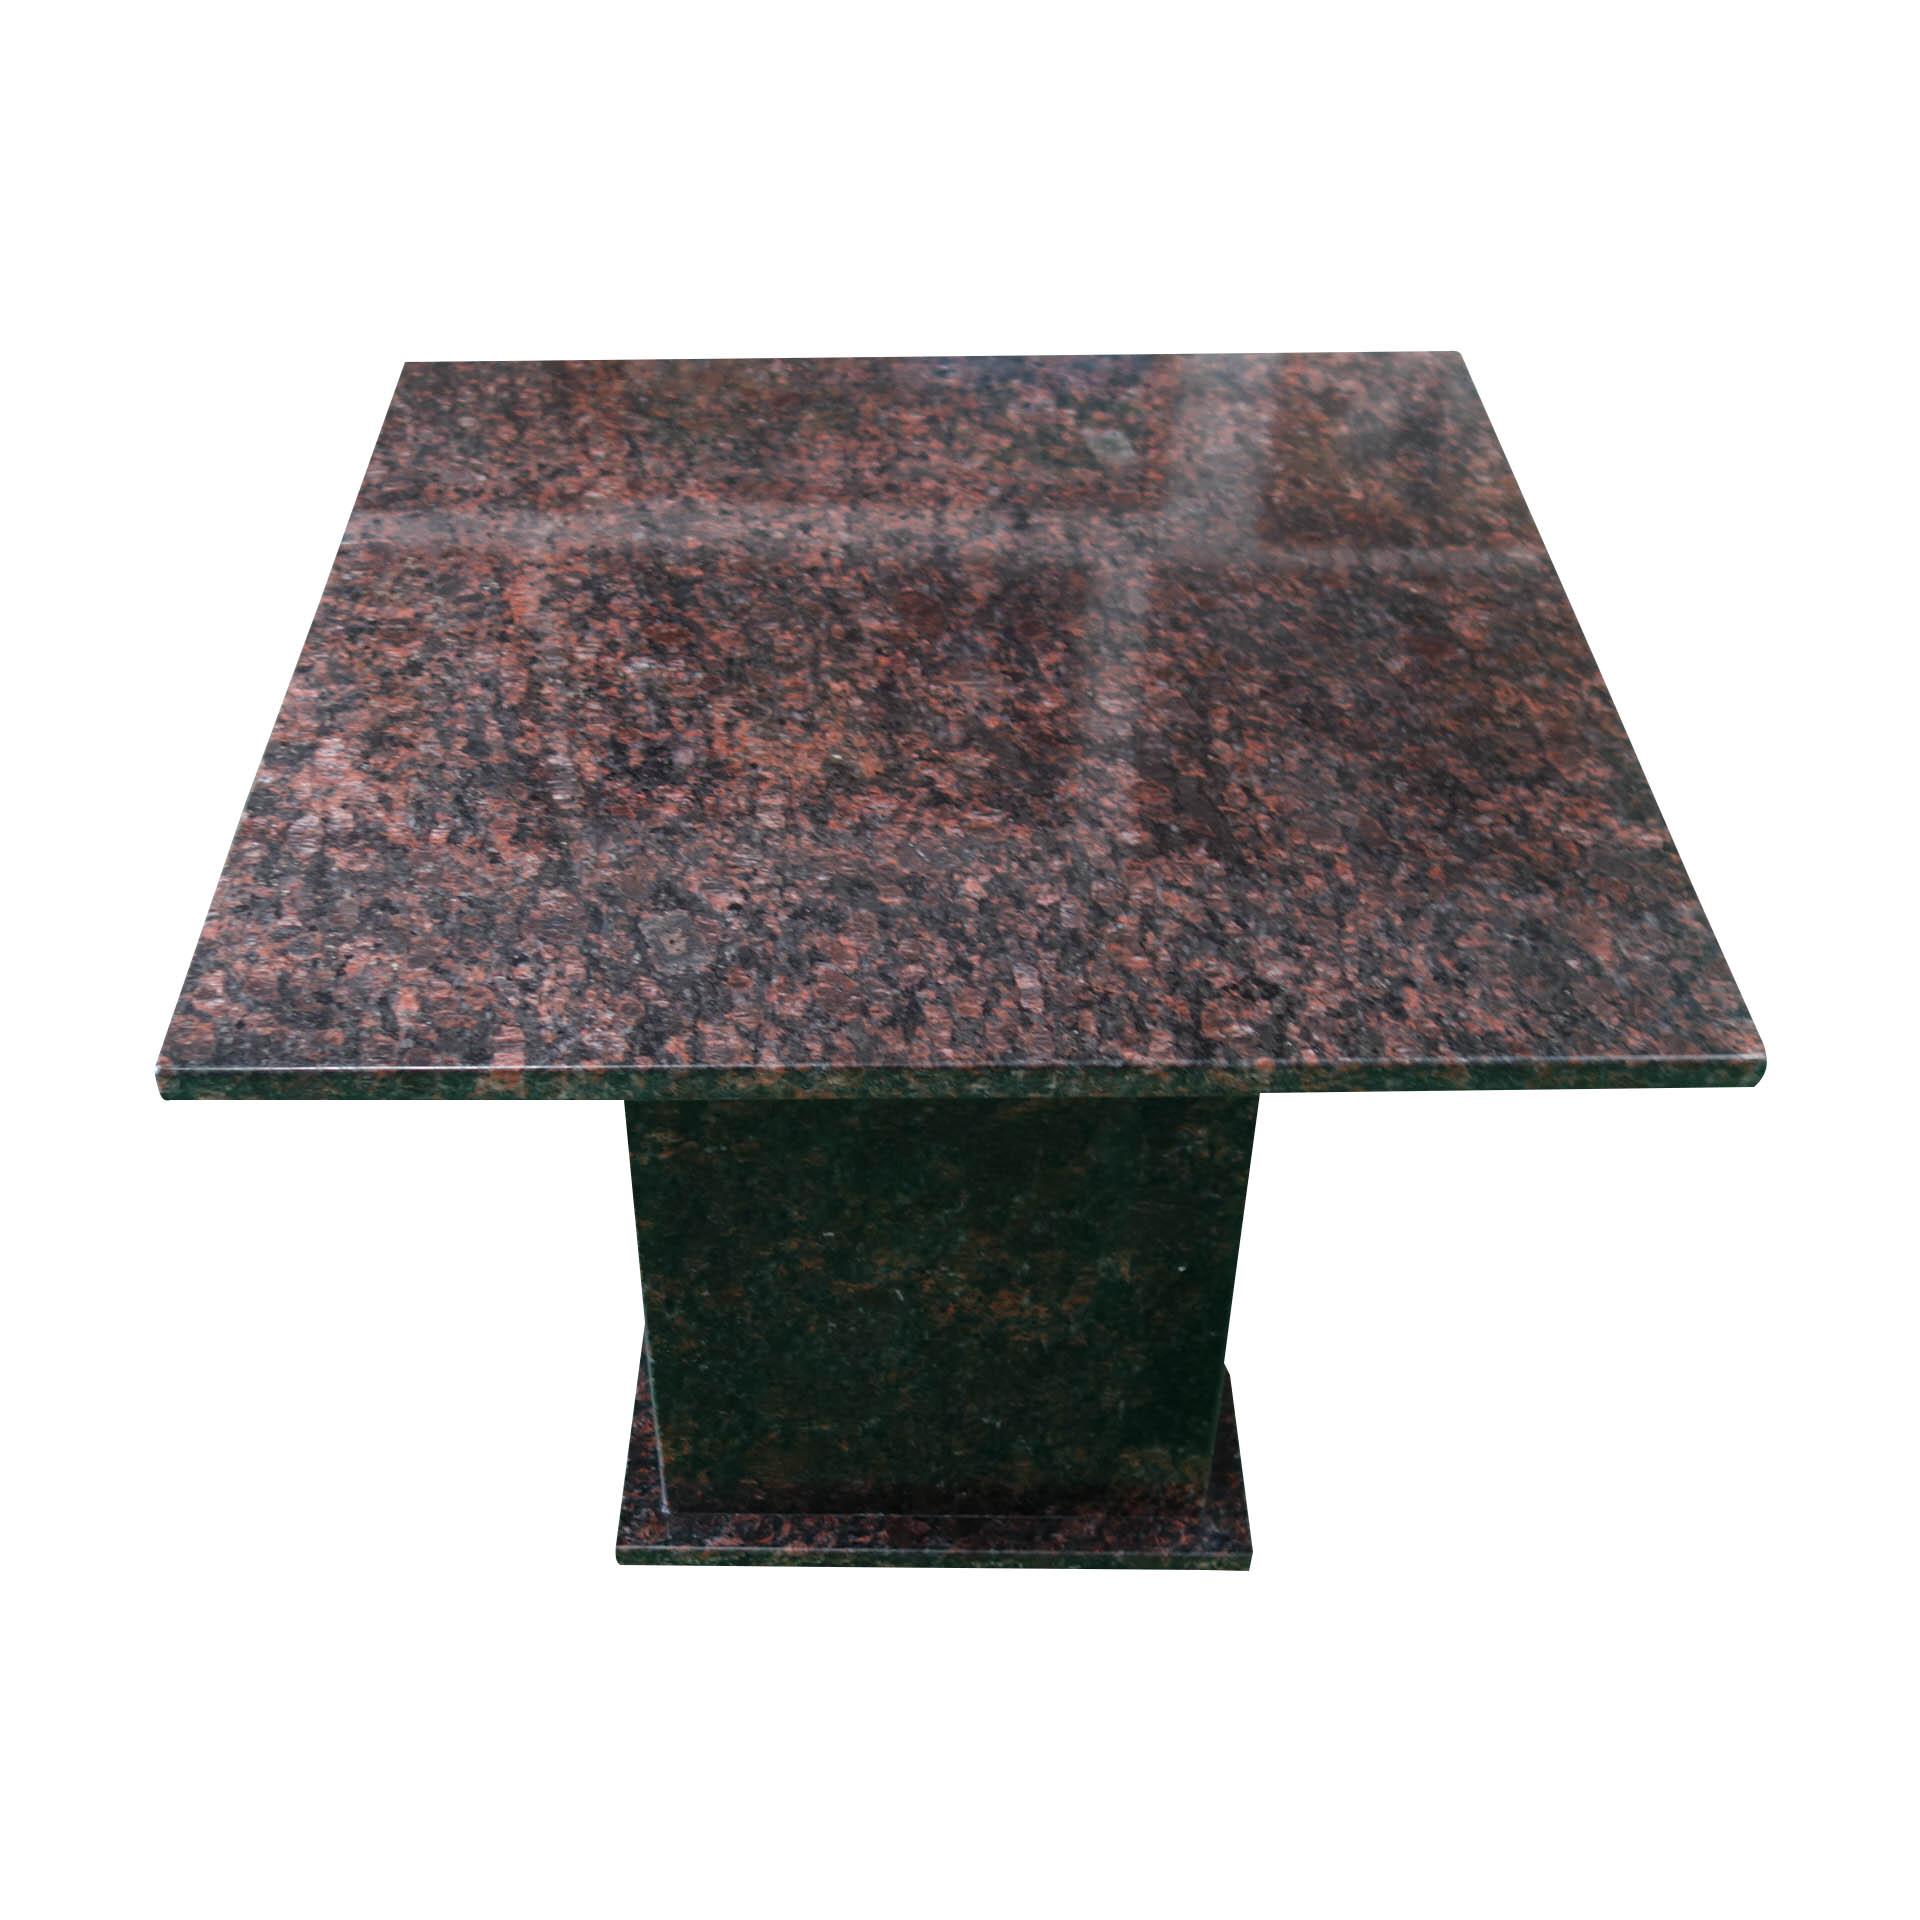 BALTIC BROWN Galaxy Granite Coffee Table